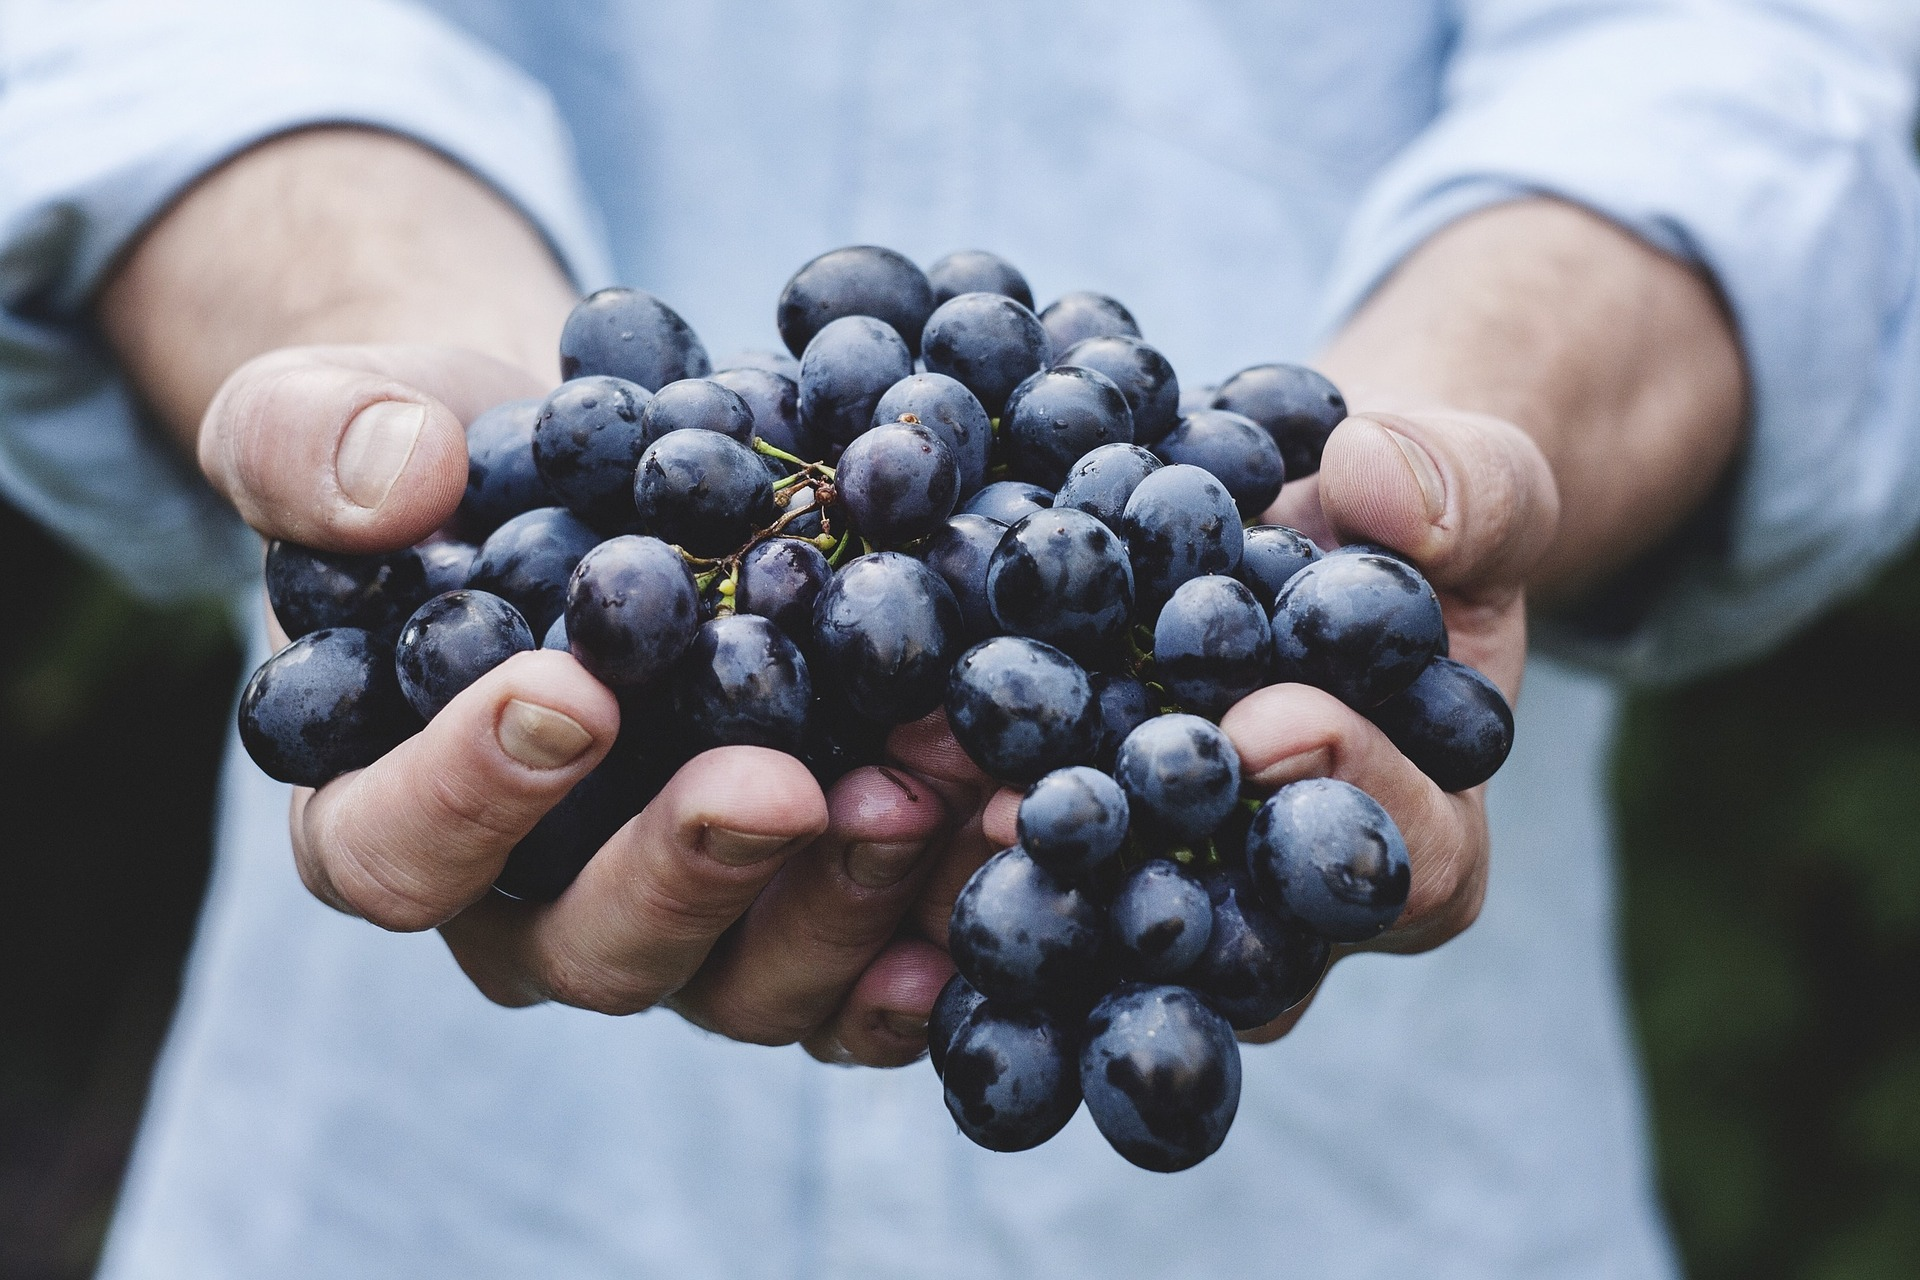 grapes-690230_1920.jpg